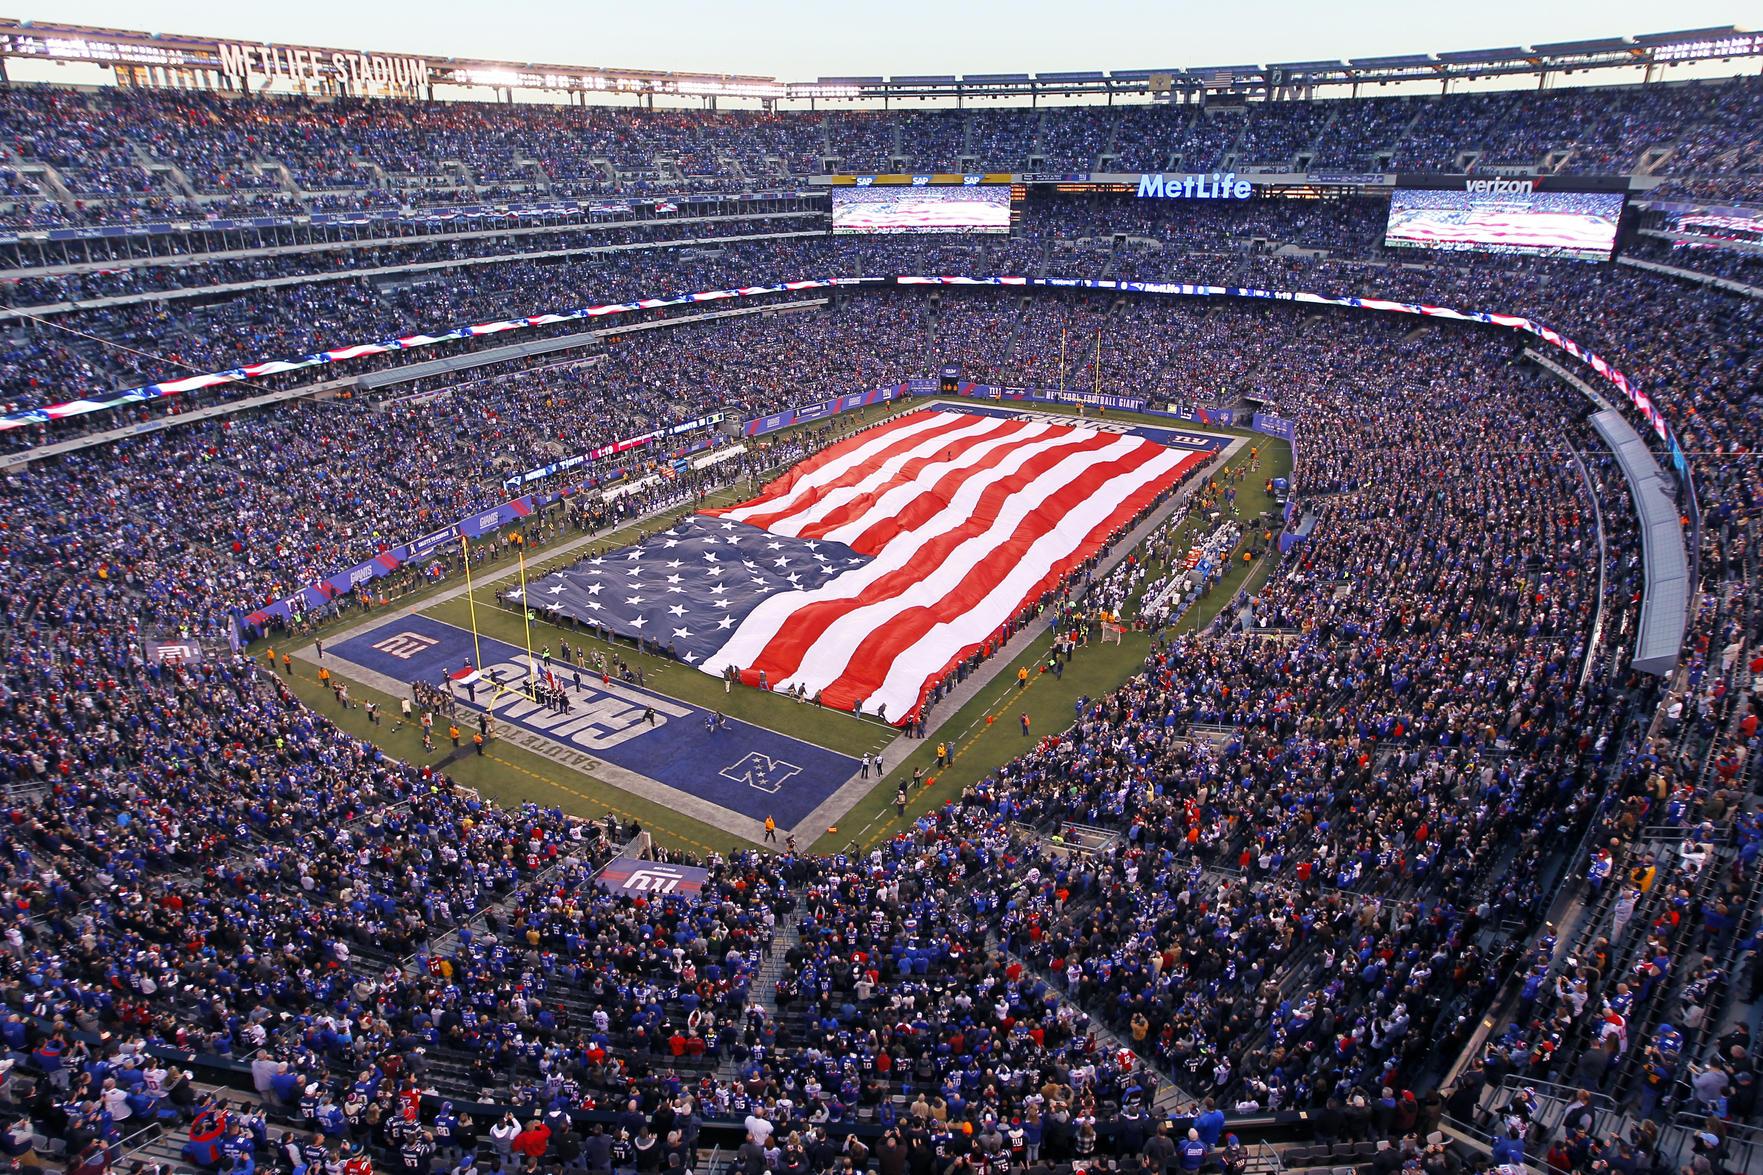 Giants com | Gameday Guide